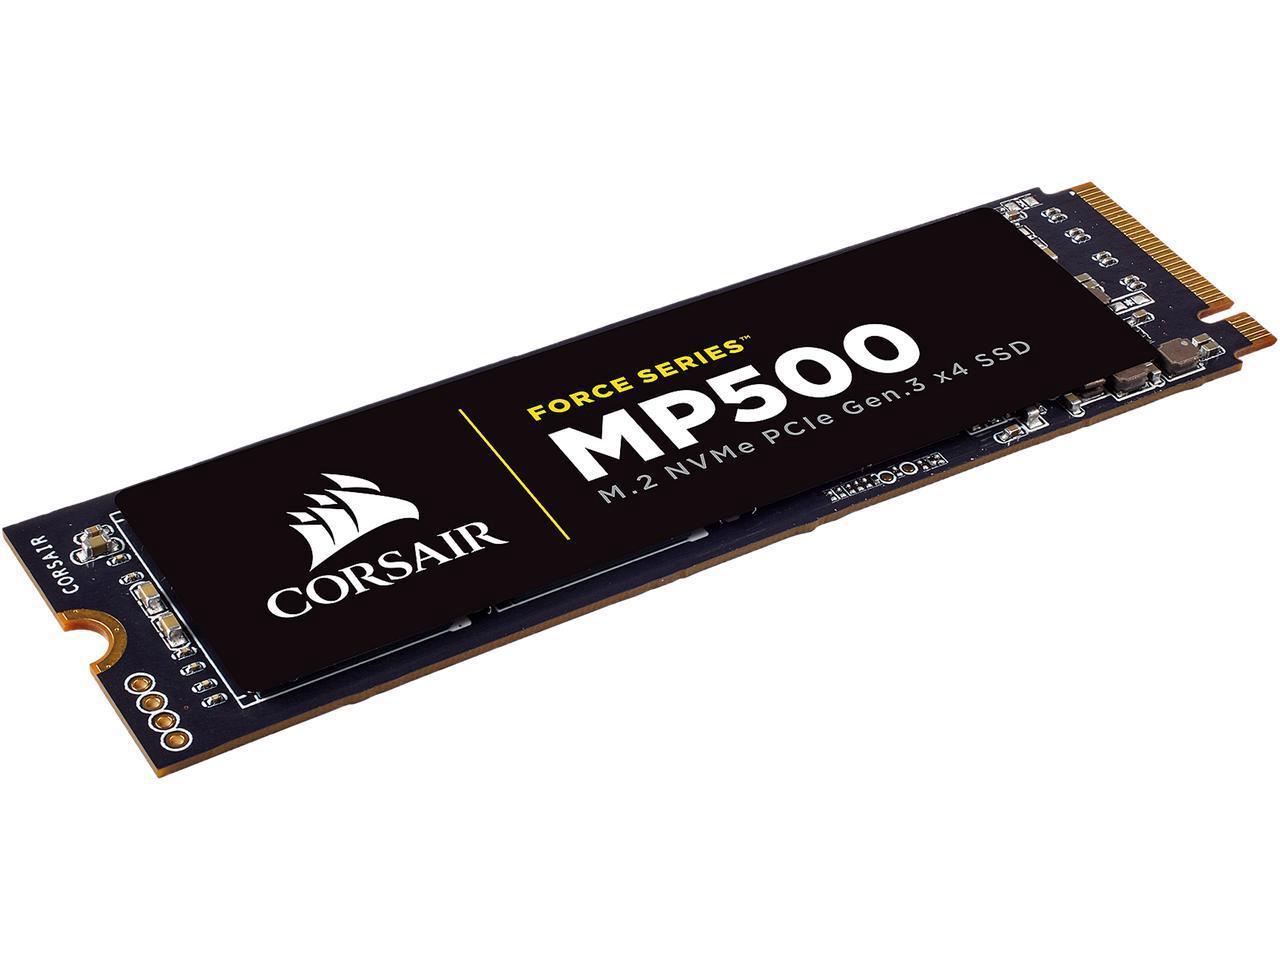 Corsair SSD Force Series MP500 M.2 2280 240GB NVMe PCI-Express 3.0 x4 MLC 240G PCIe Gen. 3 Internal Solid State Drive CSSD-F240GBMP500 2